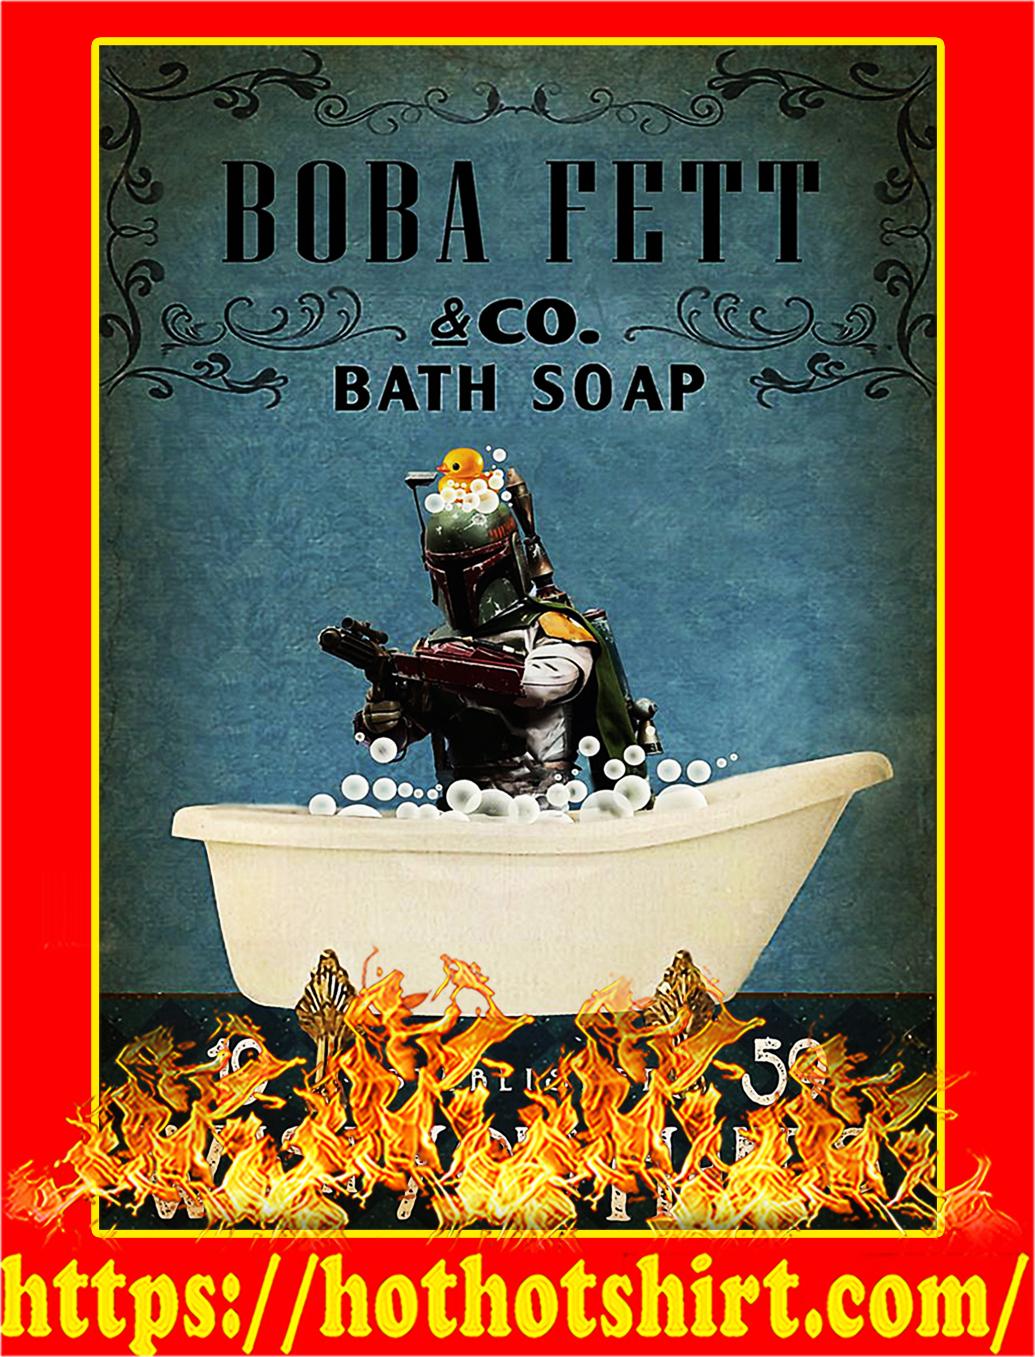 Bath soap company boba bett wash your hands poster - A2